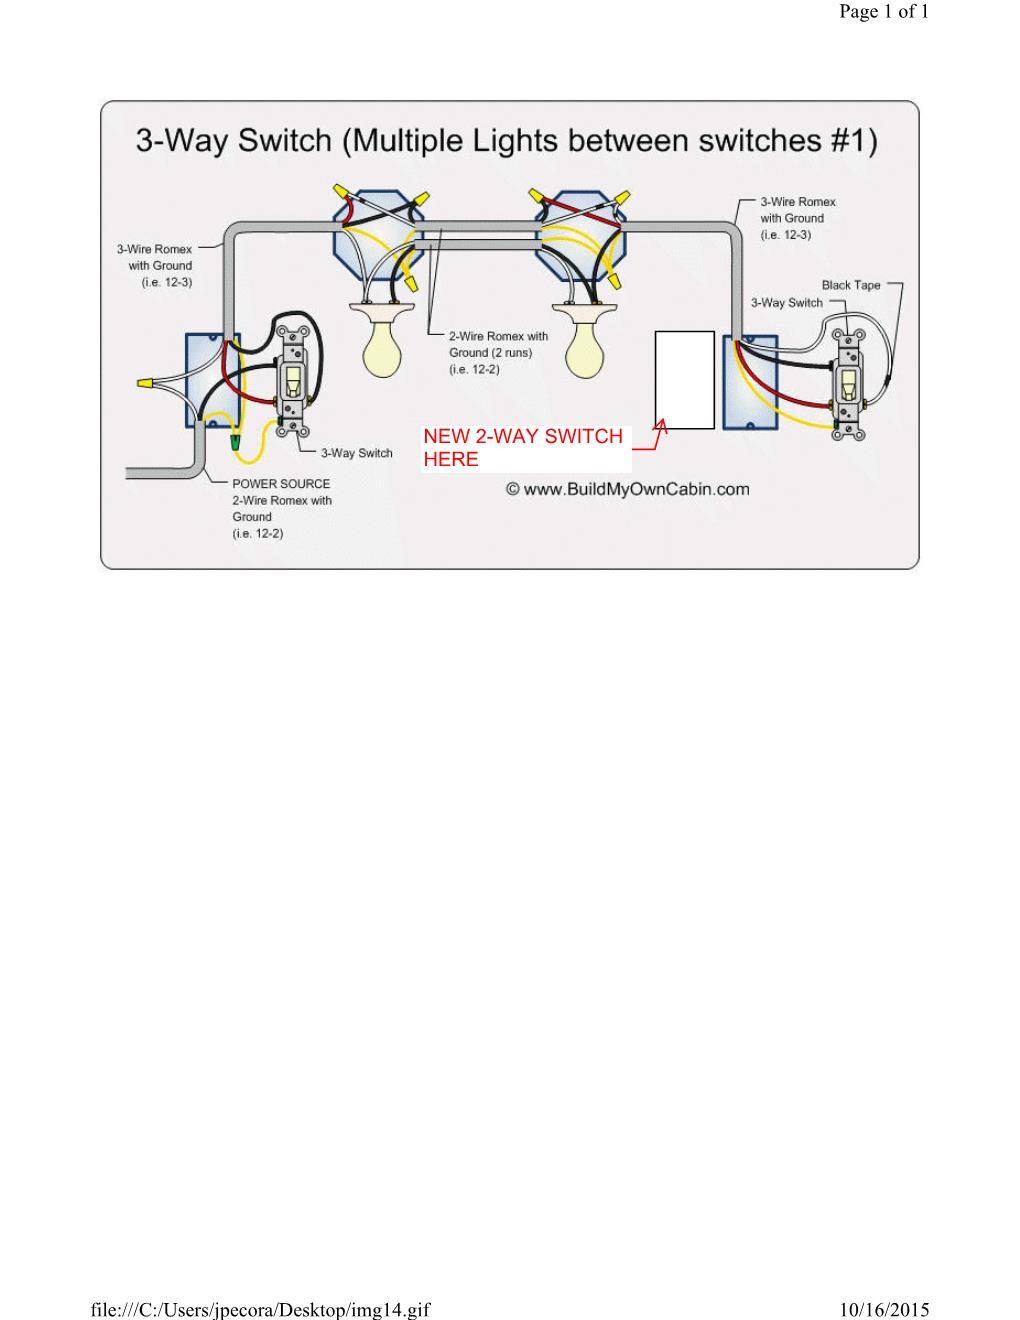 3 Way Switch Single Pole Wiring Diagram Free Download Wiring Diagram ...